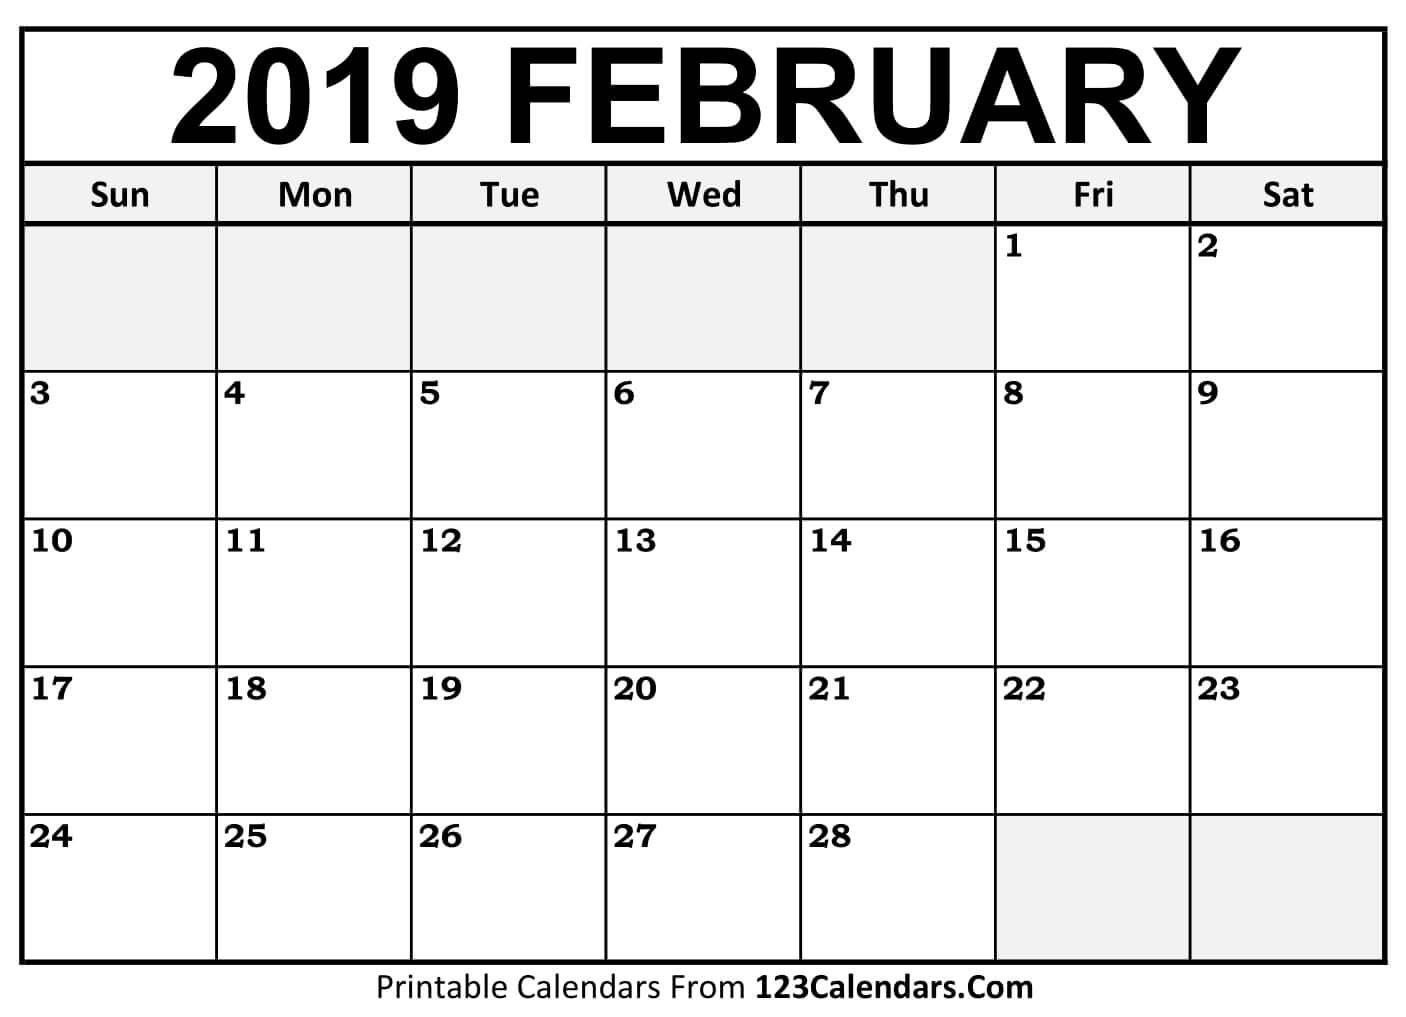 2019 February Calendar Holidays In Word – Free Printable Calendar Calendar Of 2019 February